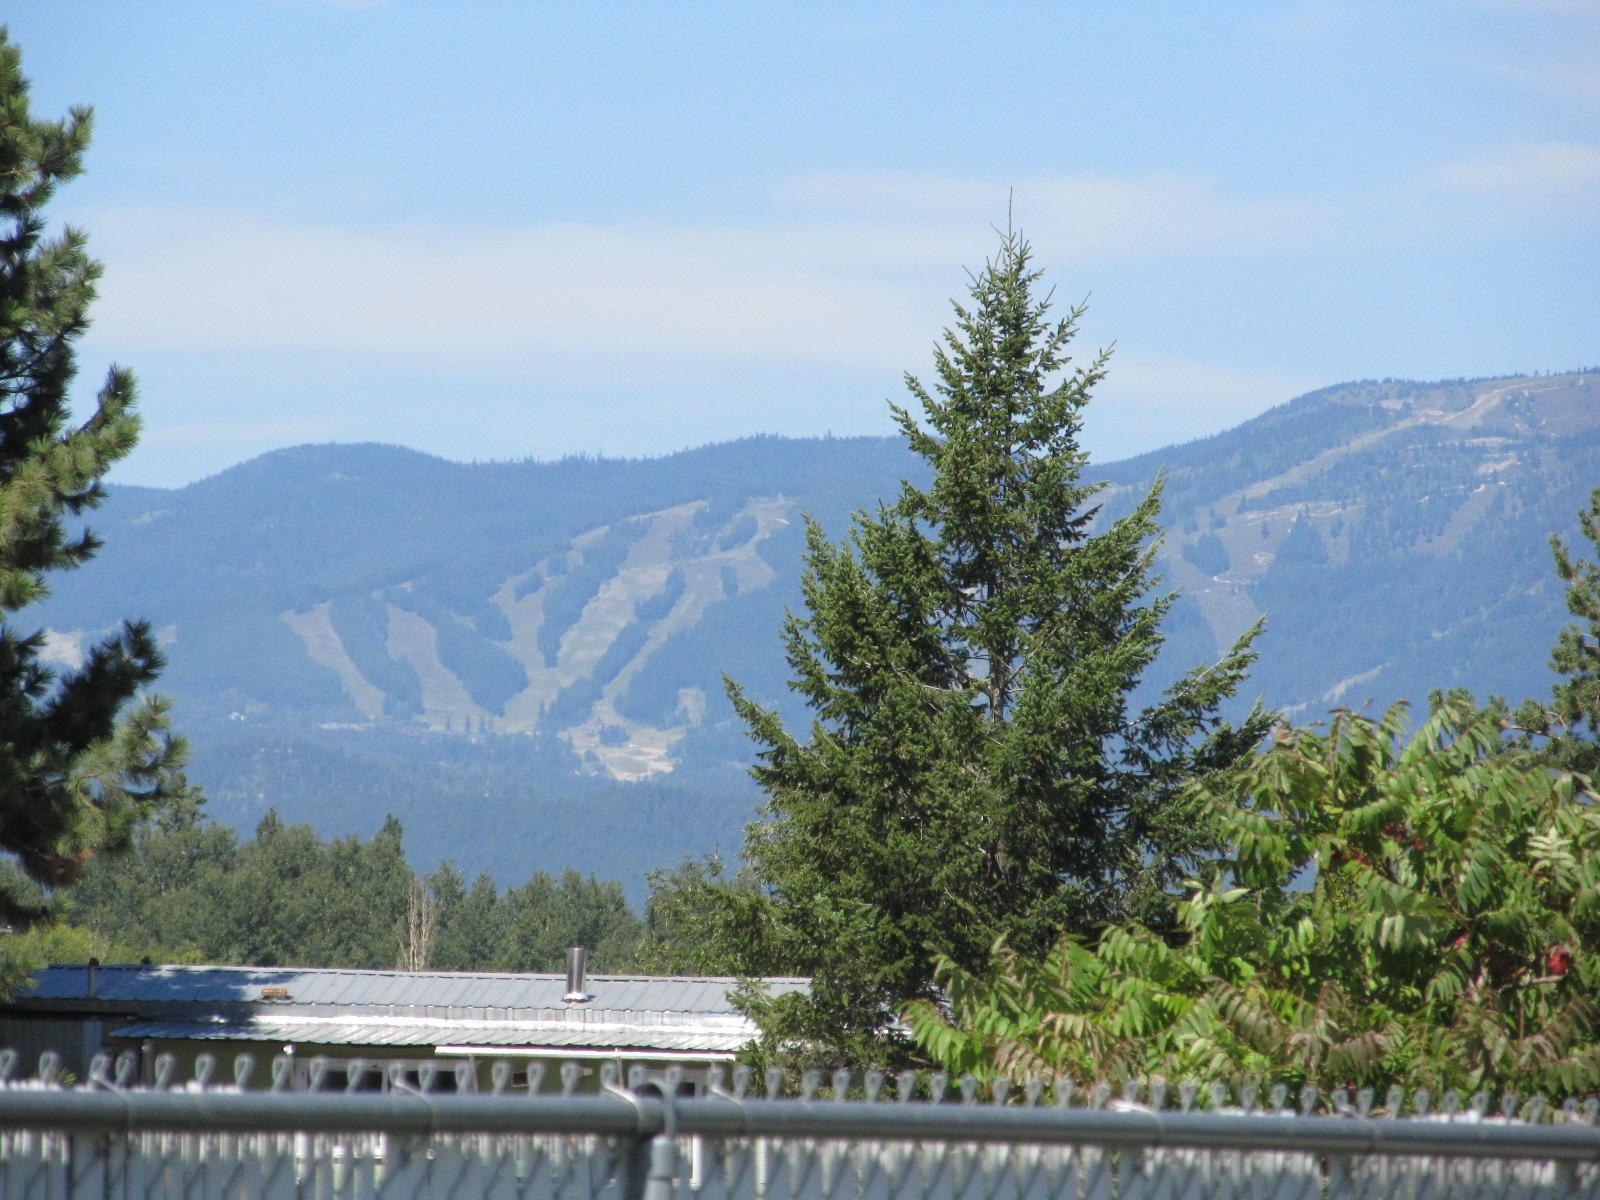 Views of the Ski Resort.